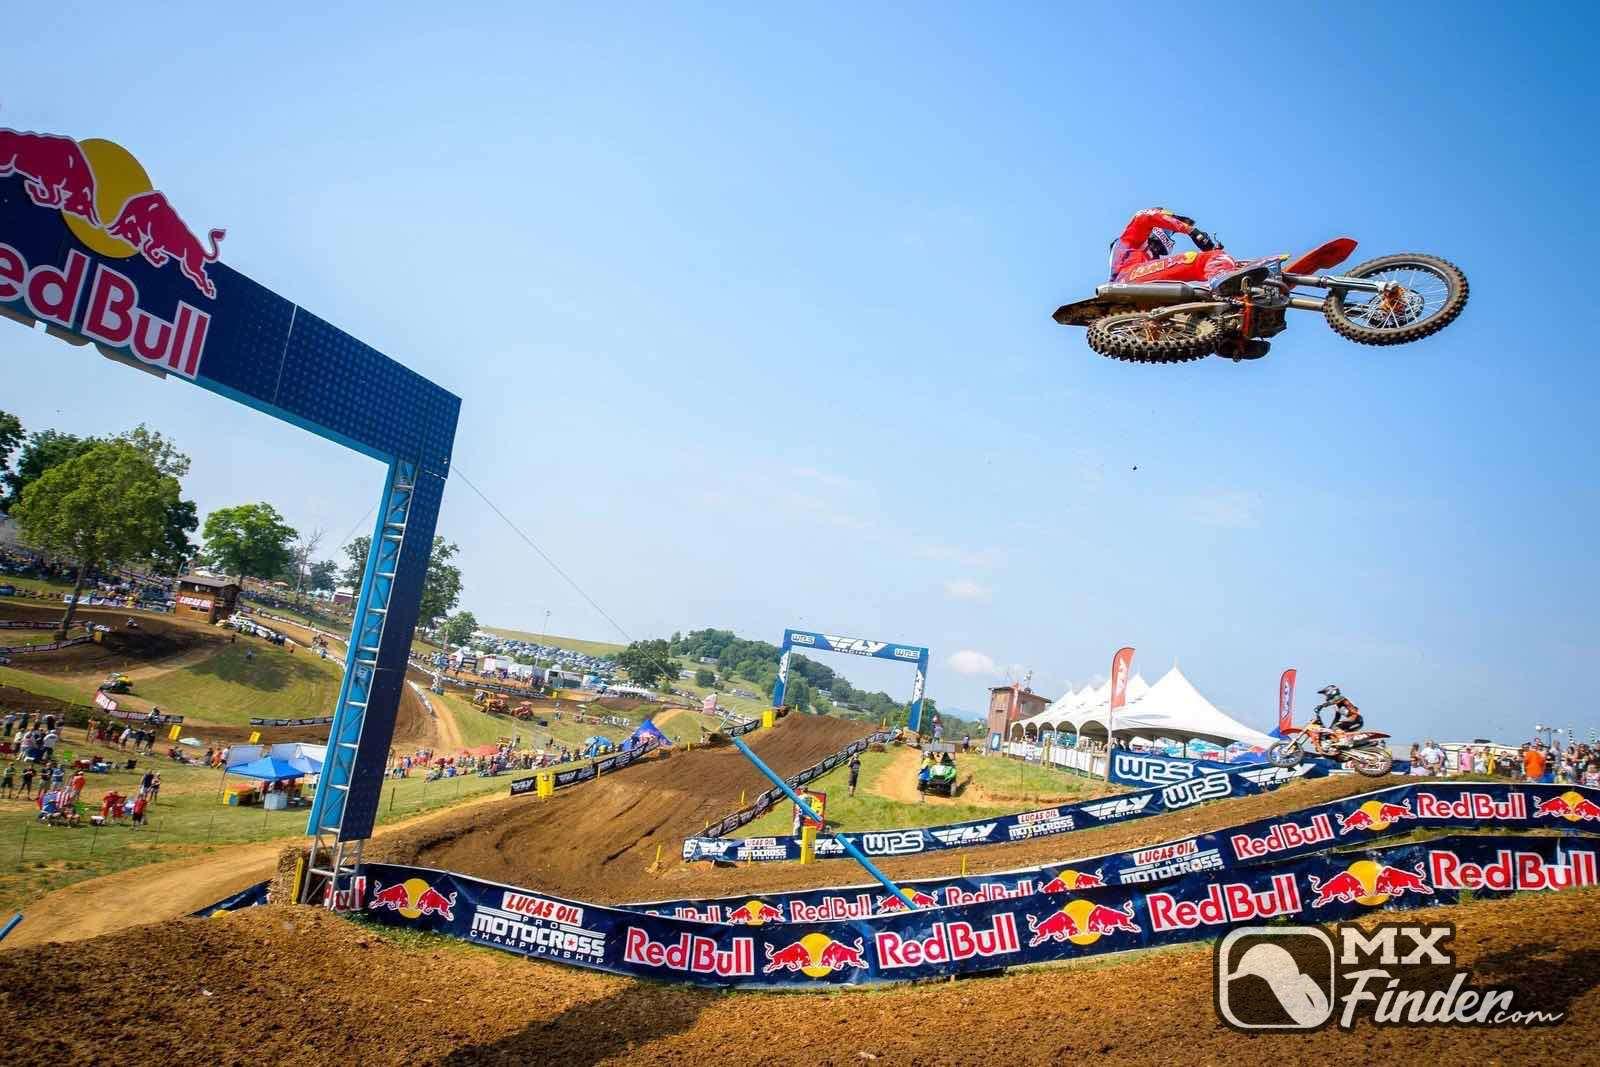 motocross, Muddy Creek Raceway, Blountville, motocross track